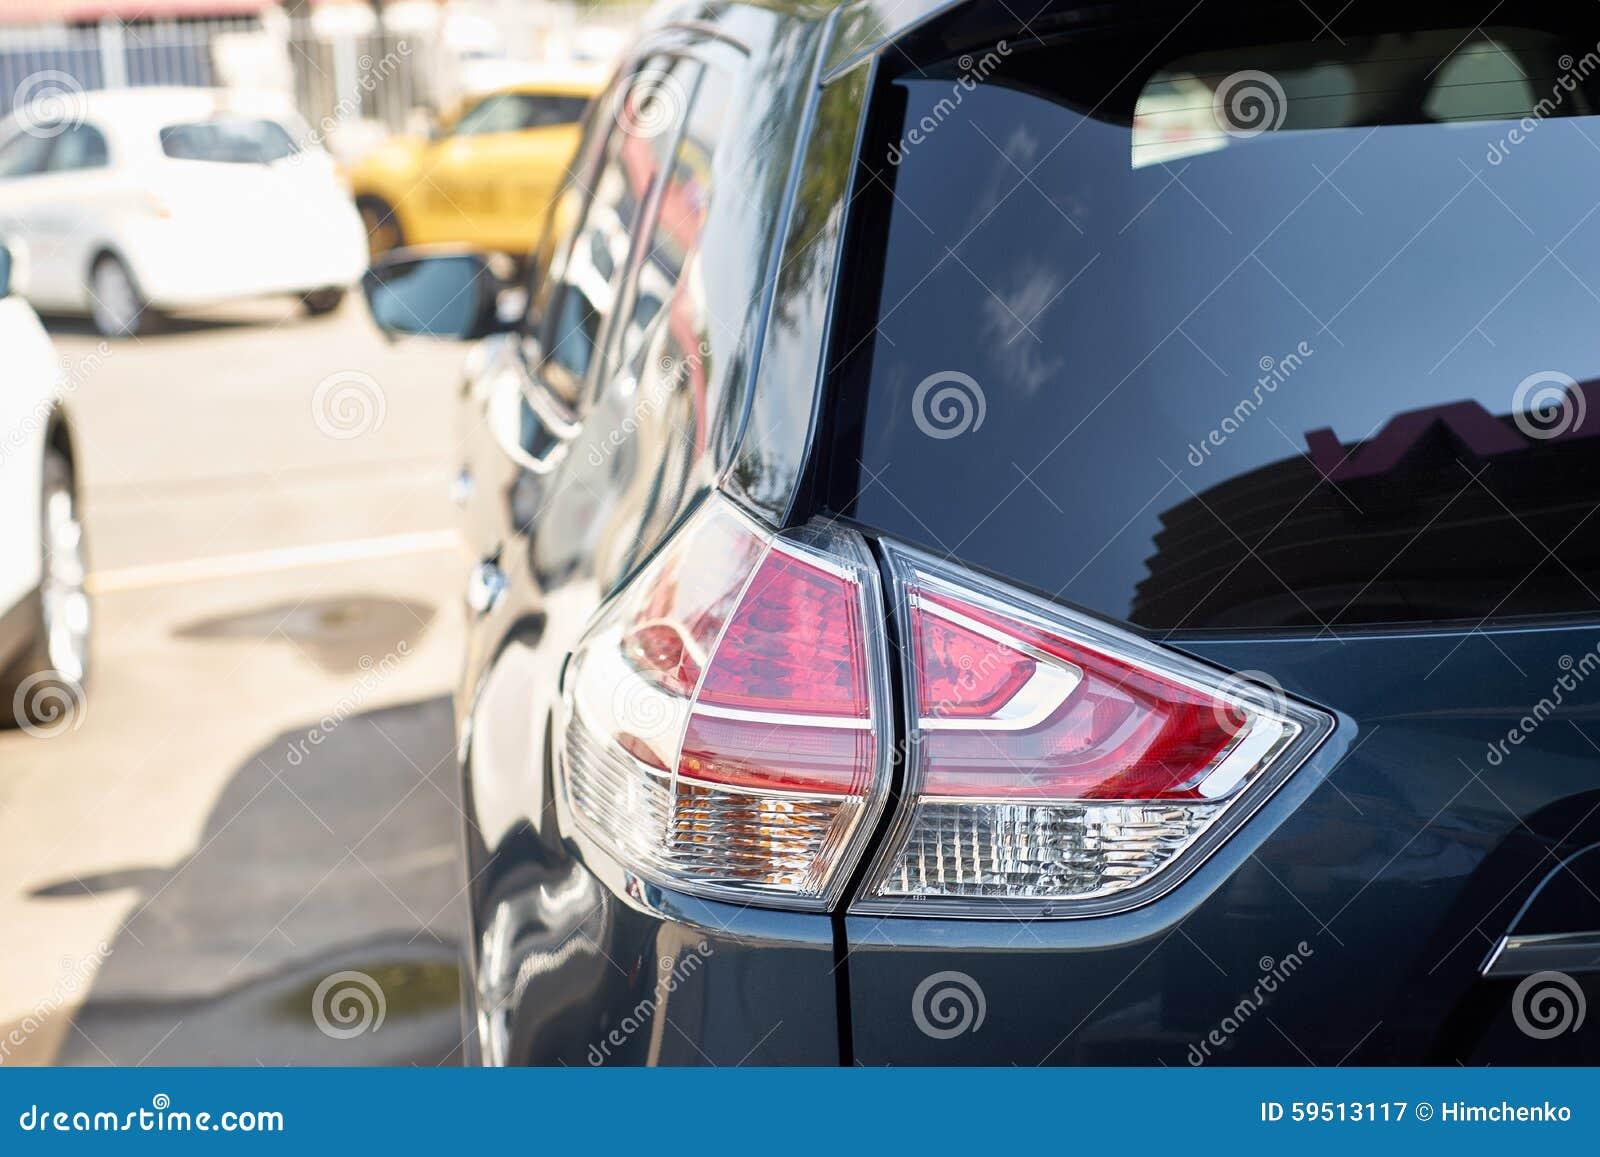 Download Wallpaper 3415x3415 Bmw Headlights Car Cloudy: Elegant Blue Car Headlight Outdoors Stock Photo